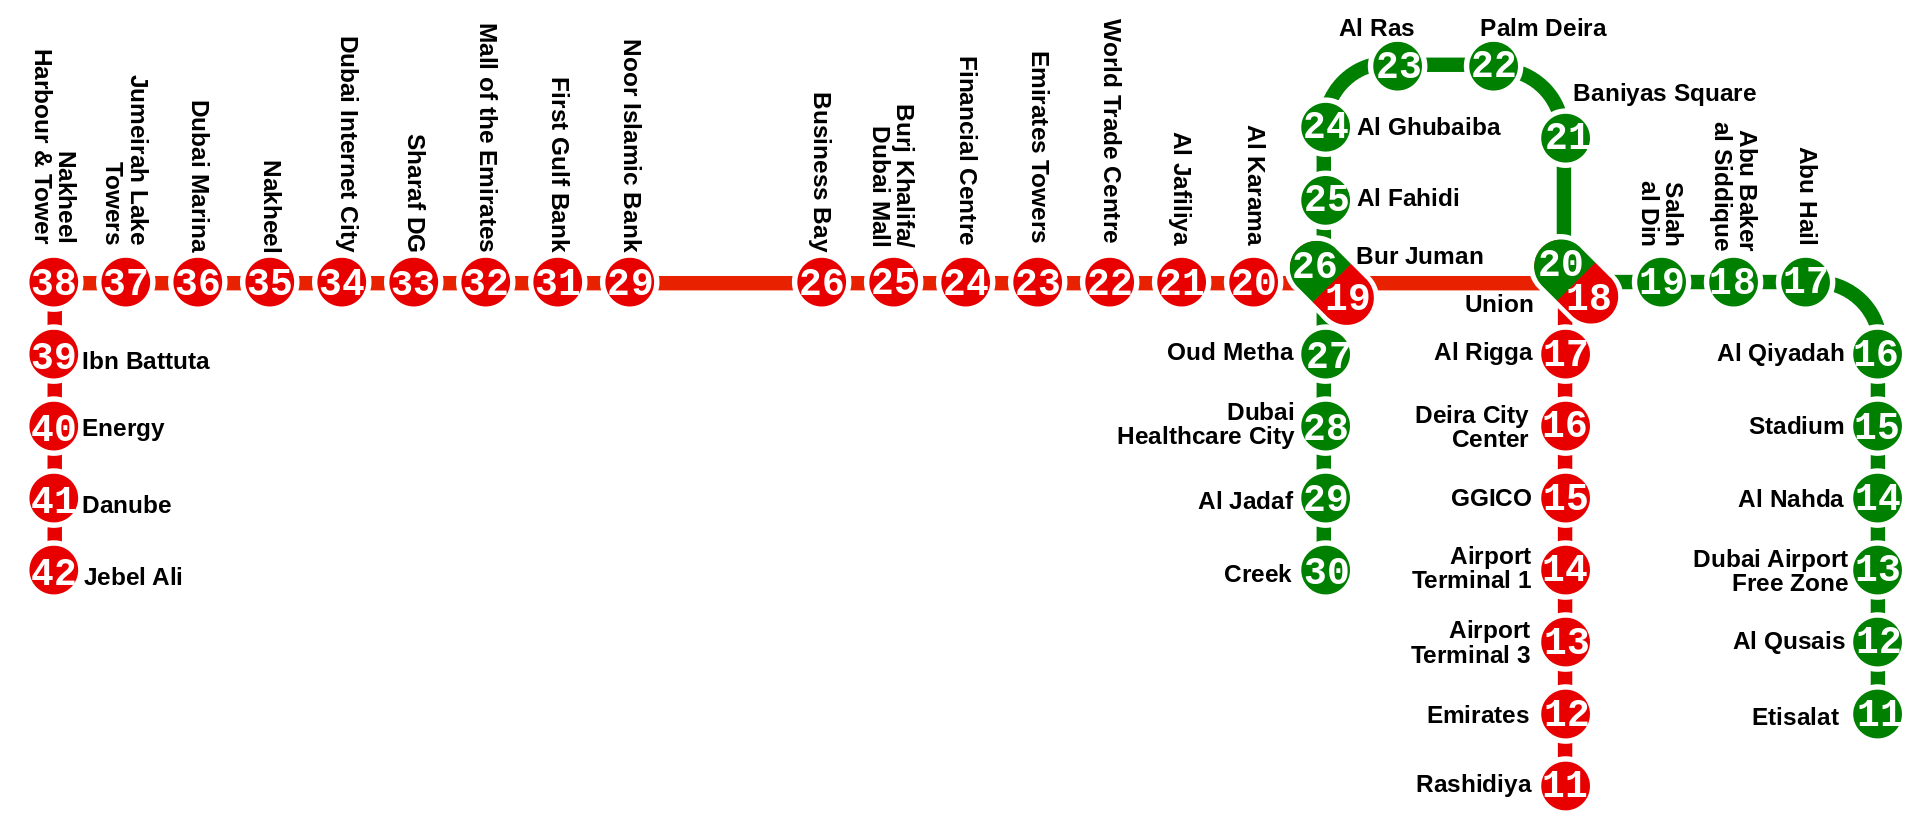 метро дубай на карте со станциями метро